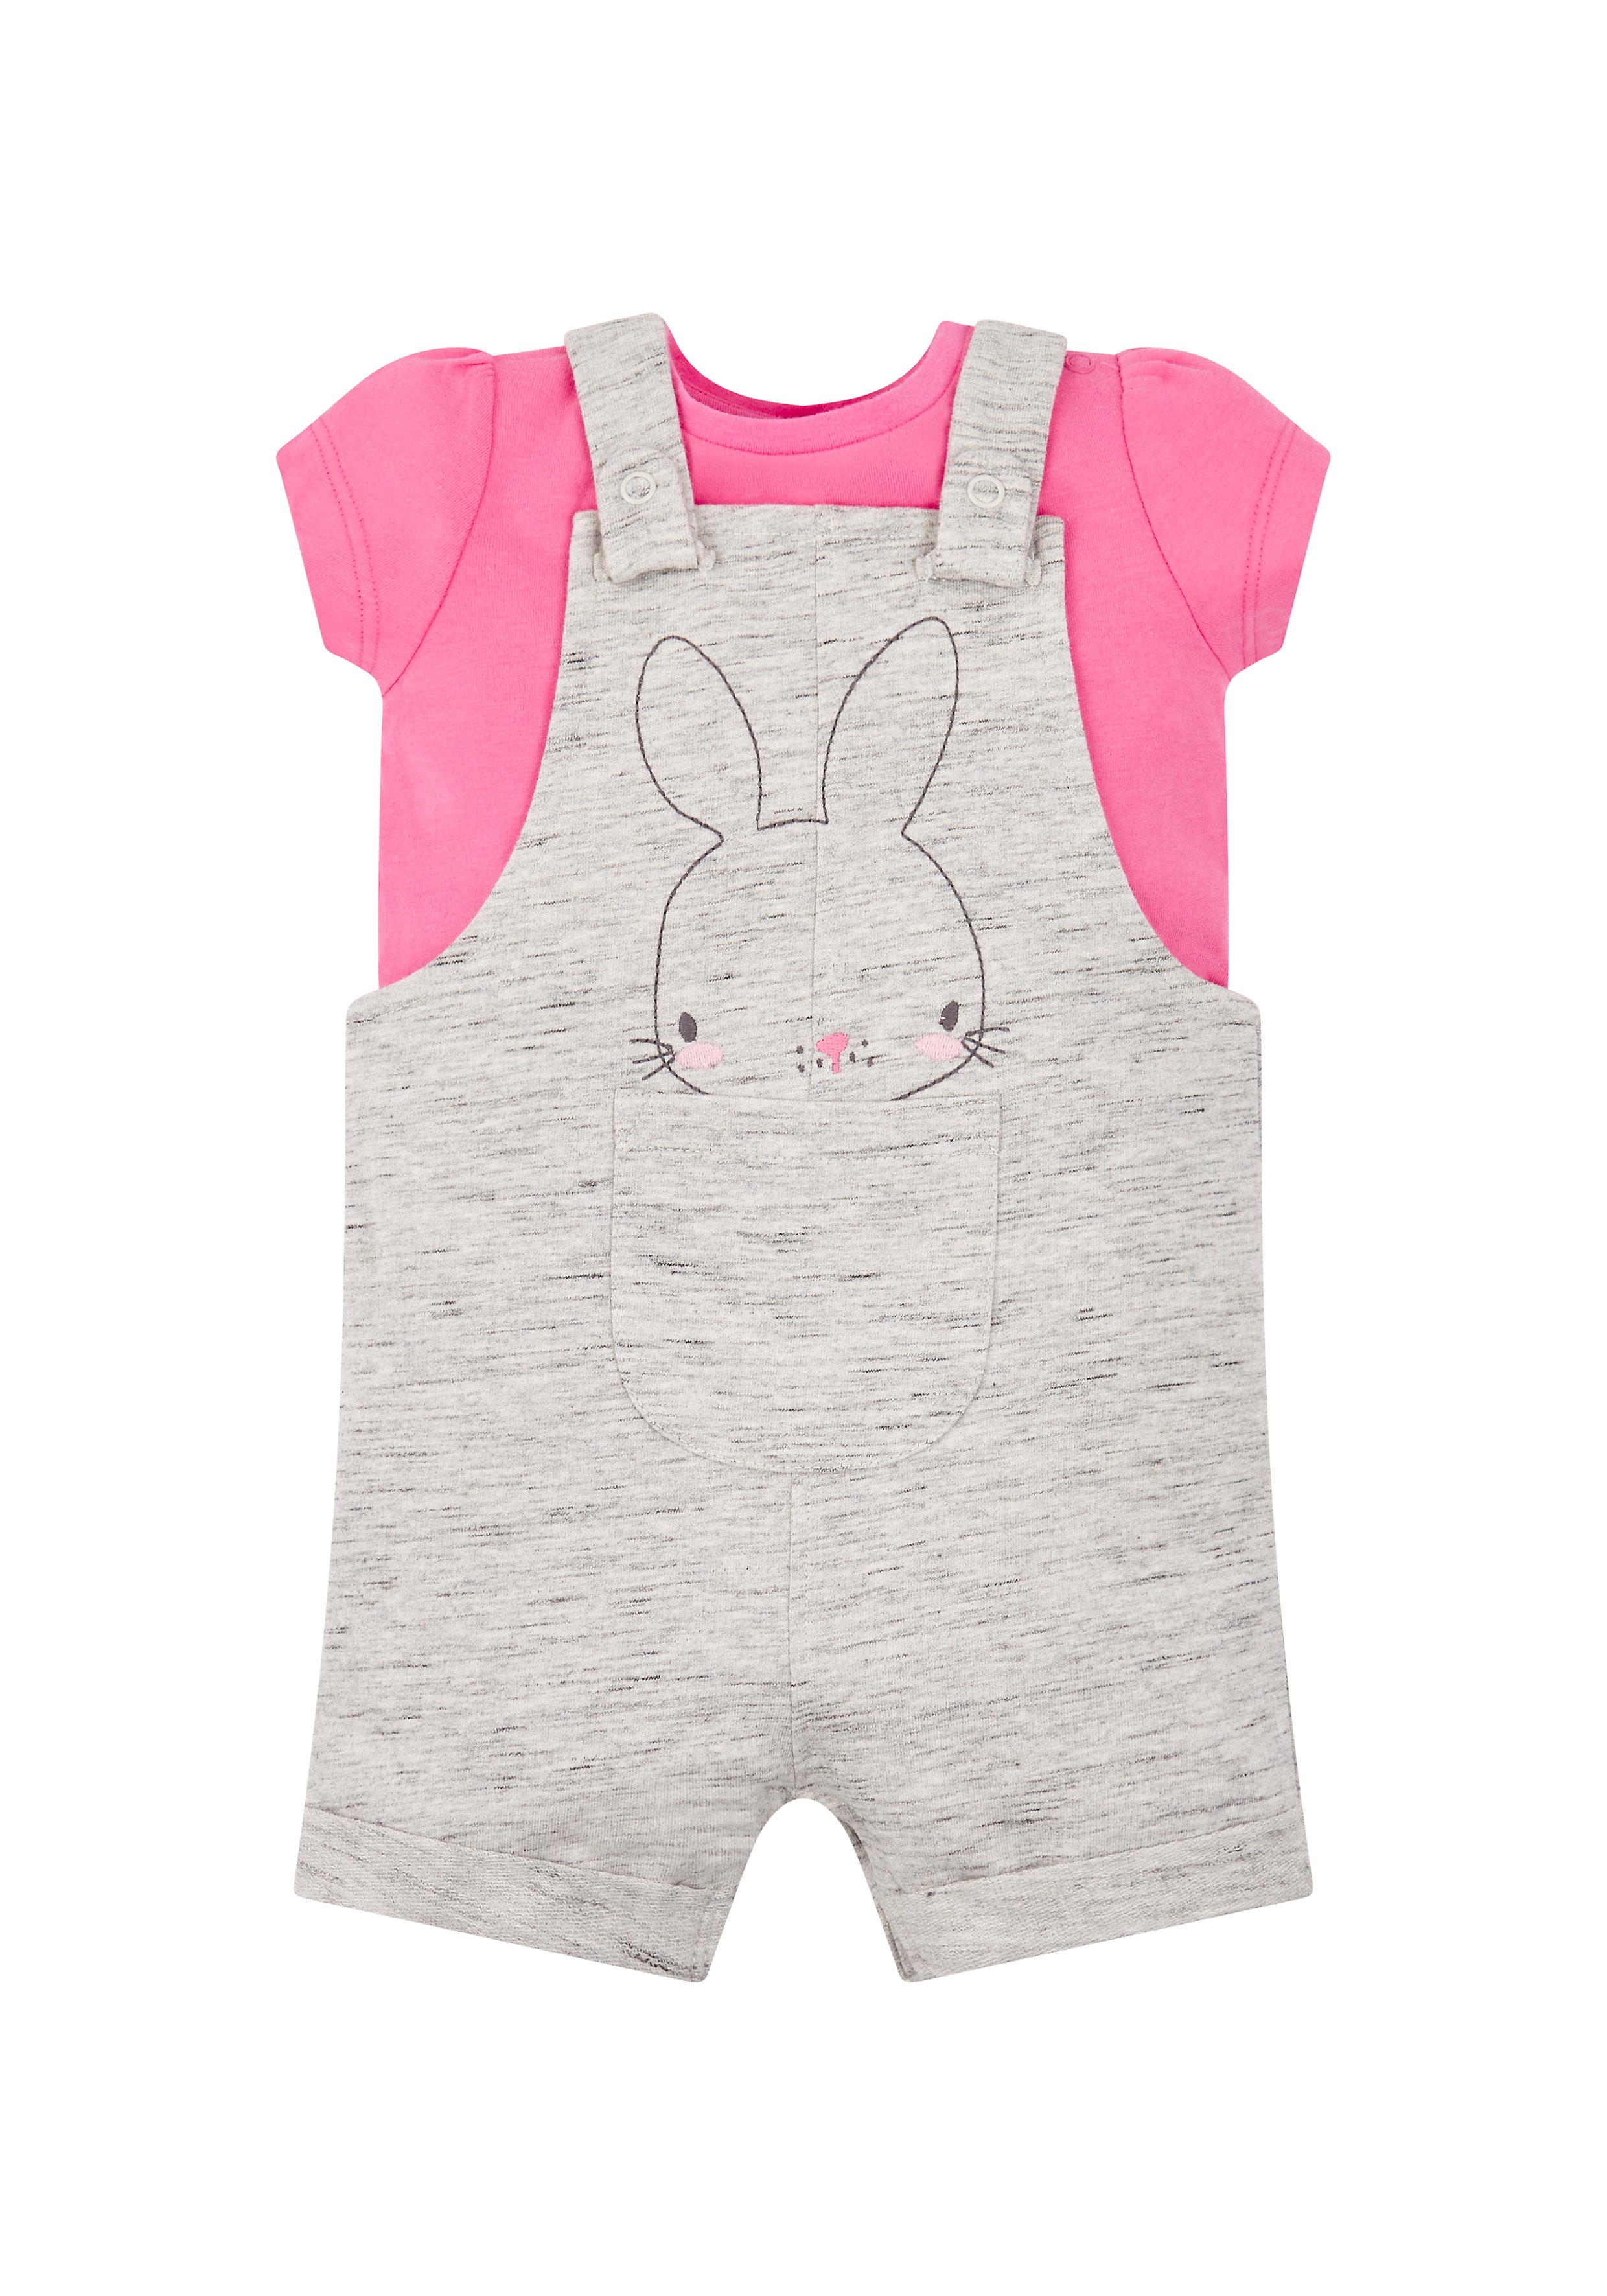 Mothercare   Girls Half Sleeves Dungaree Set Bunny Embroidery - Grey